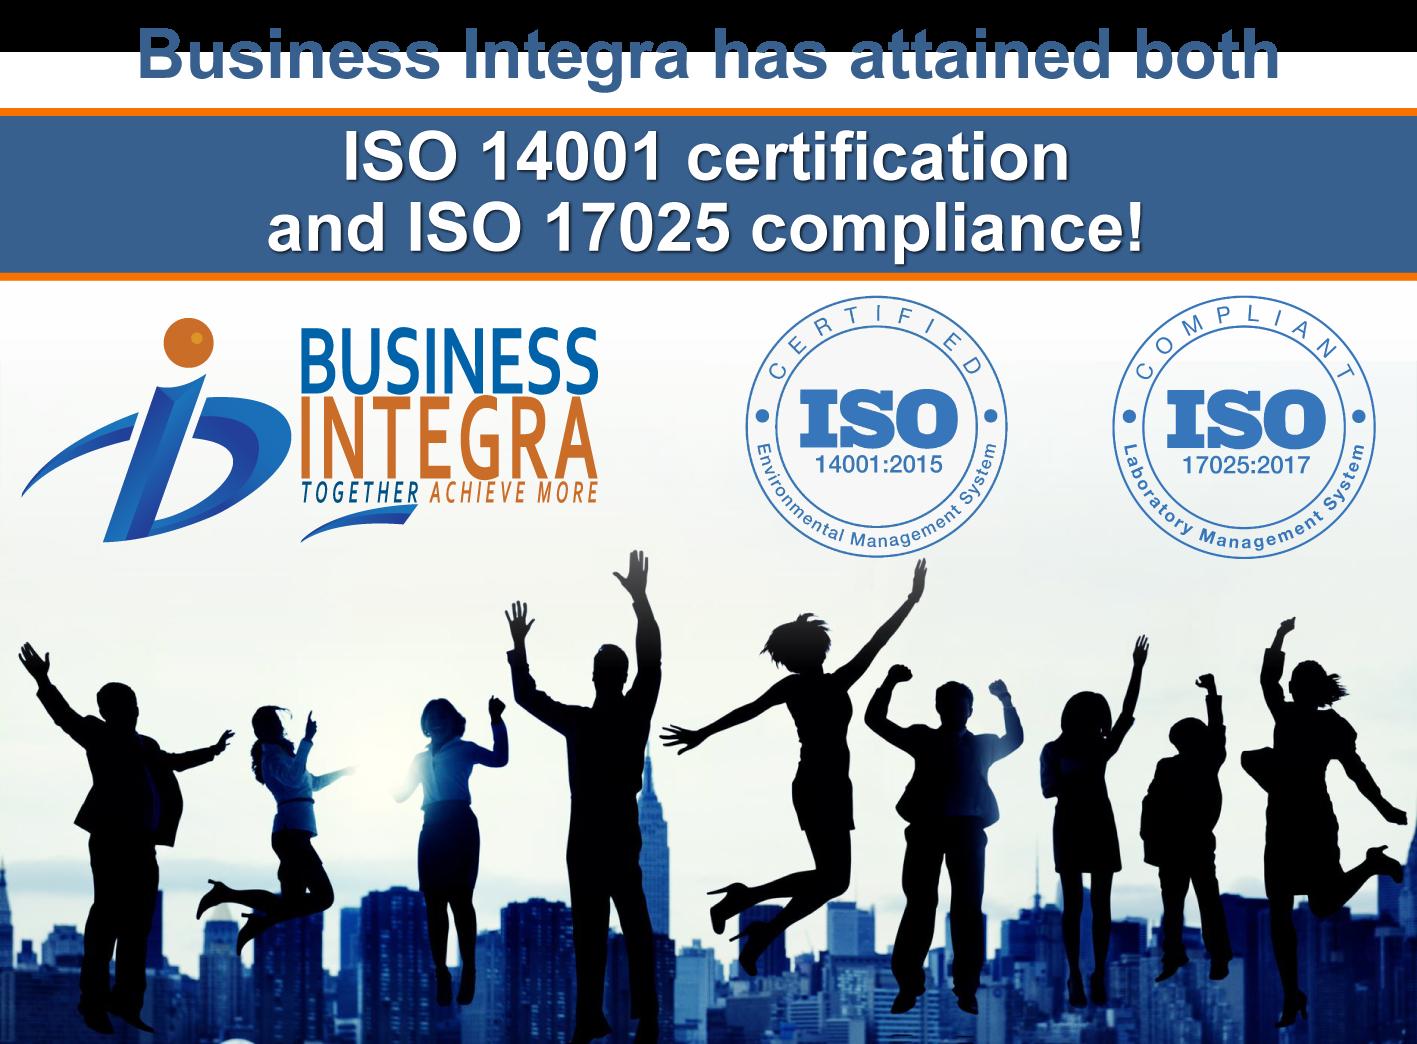 BI-ISO-Announcement